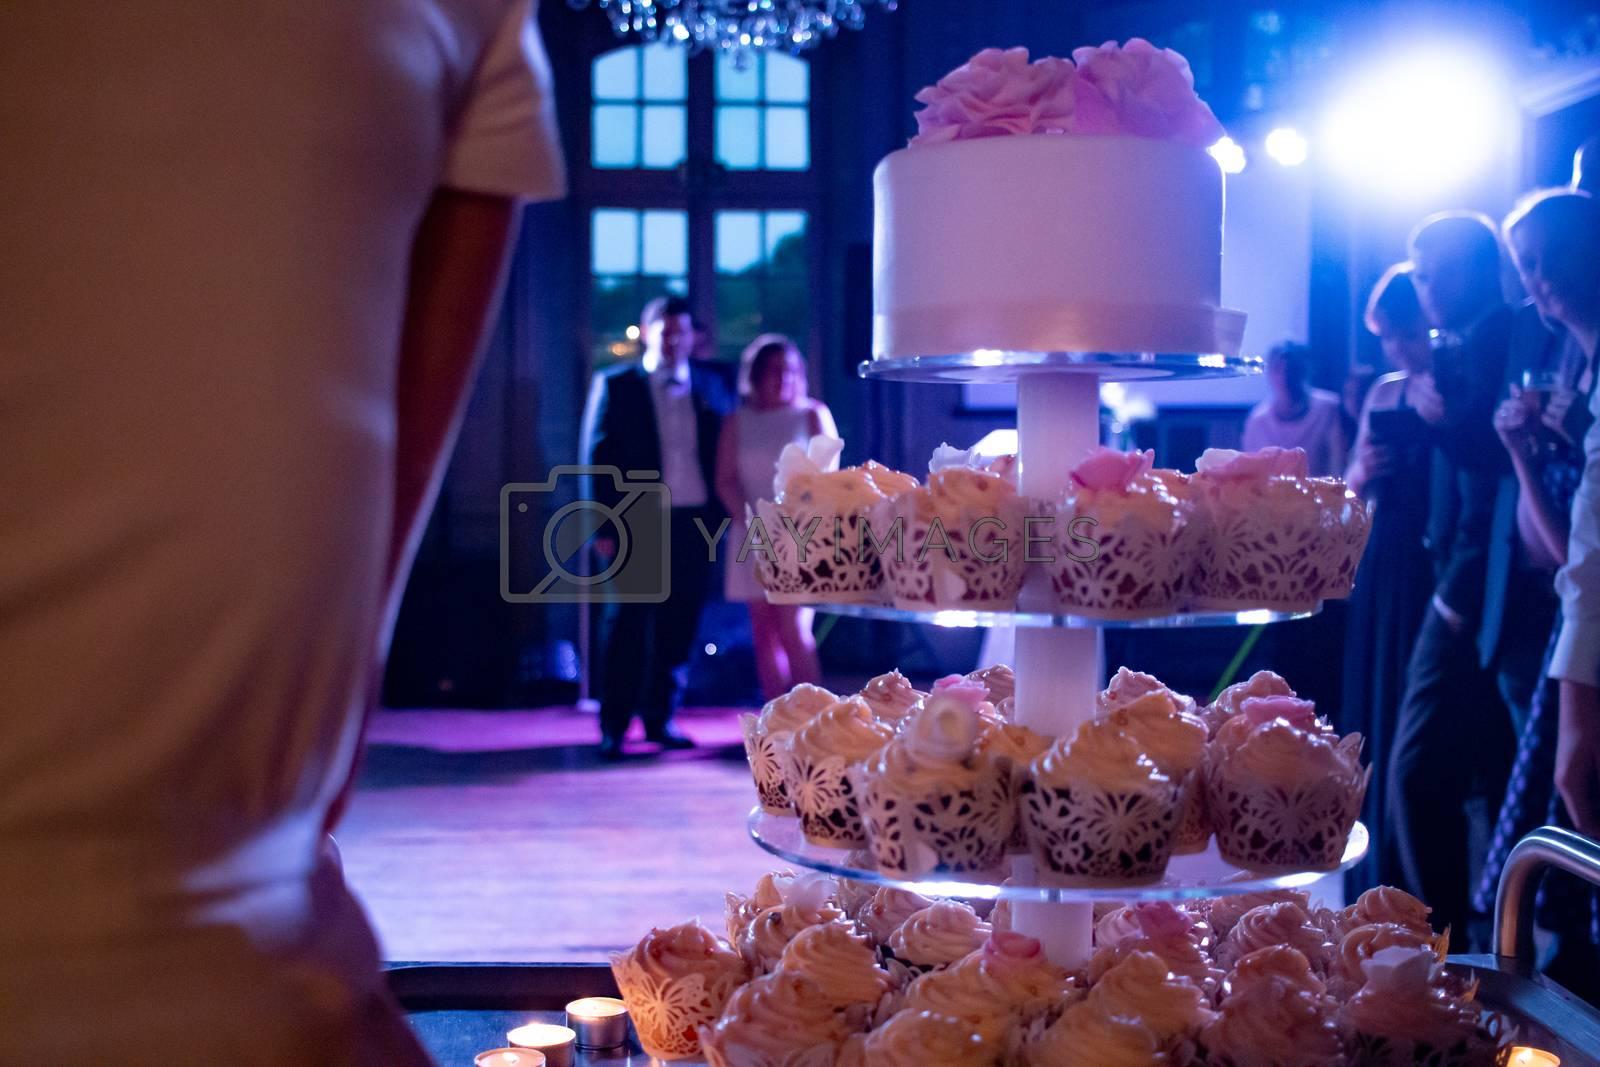 wedding cake wedding party wedding guests wedding service caering